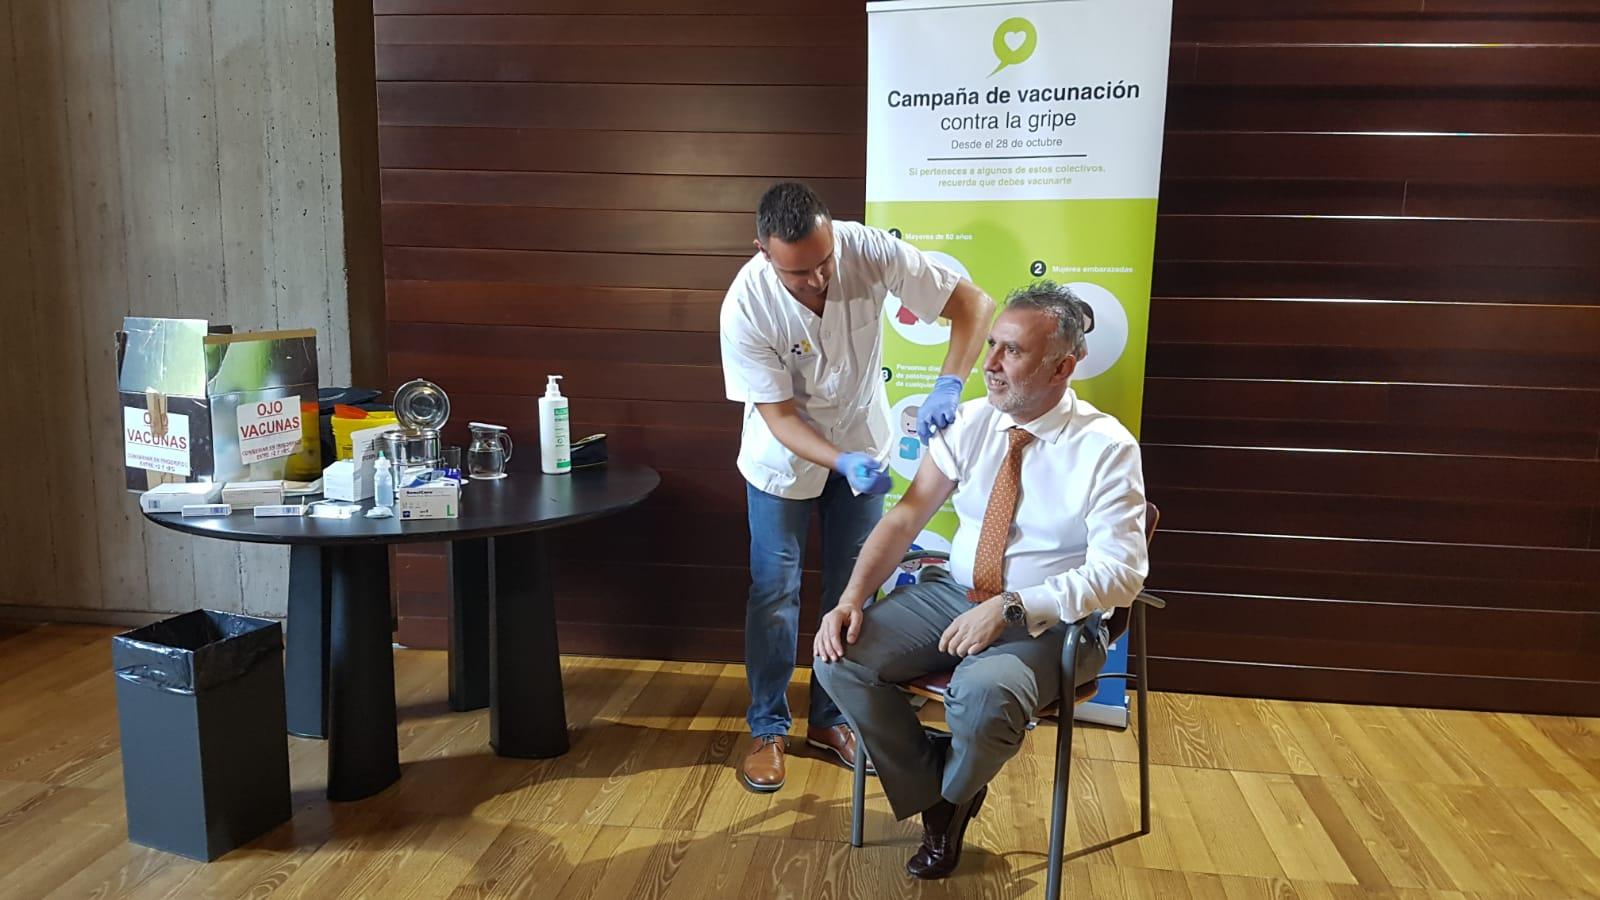 Ángel Víctor Torres vacuna gripe